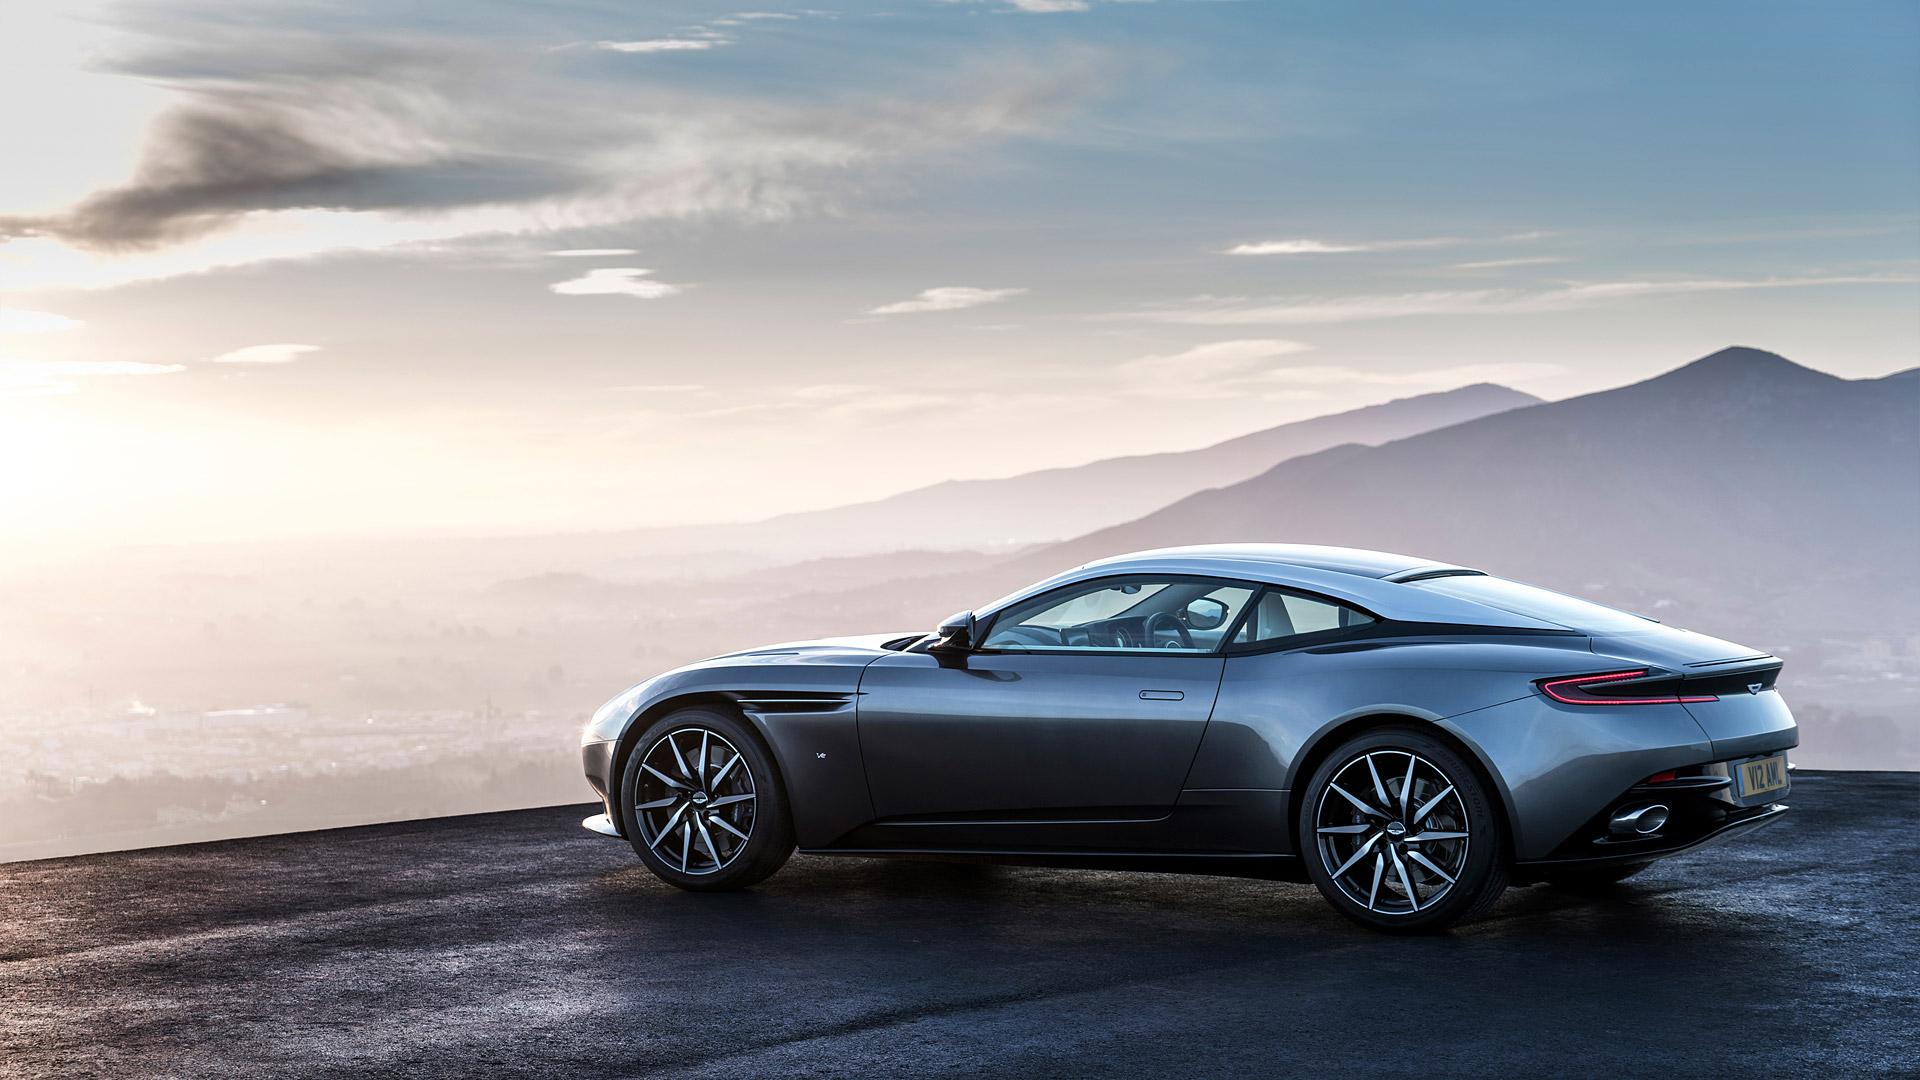 29 Aston Martin Db11 Wallpapers On Wallpapersafari